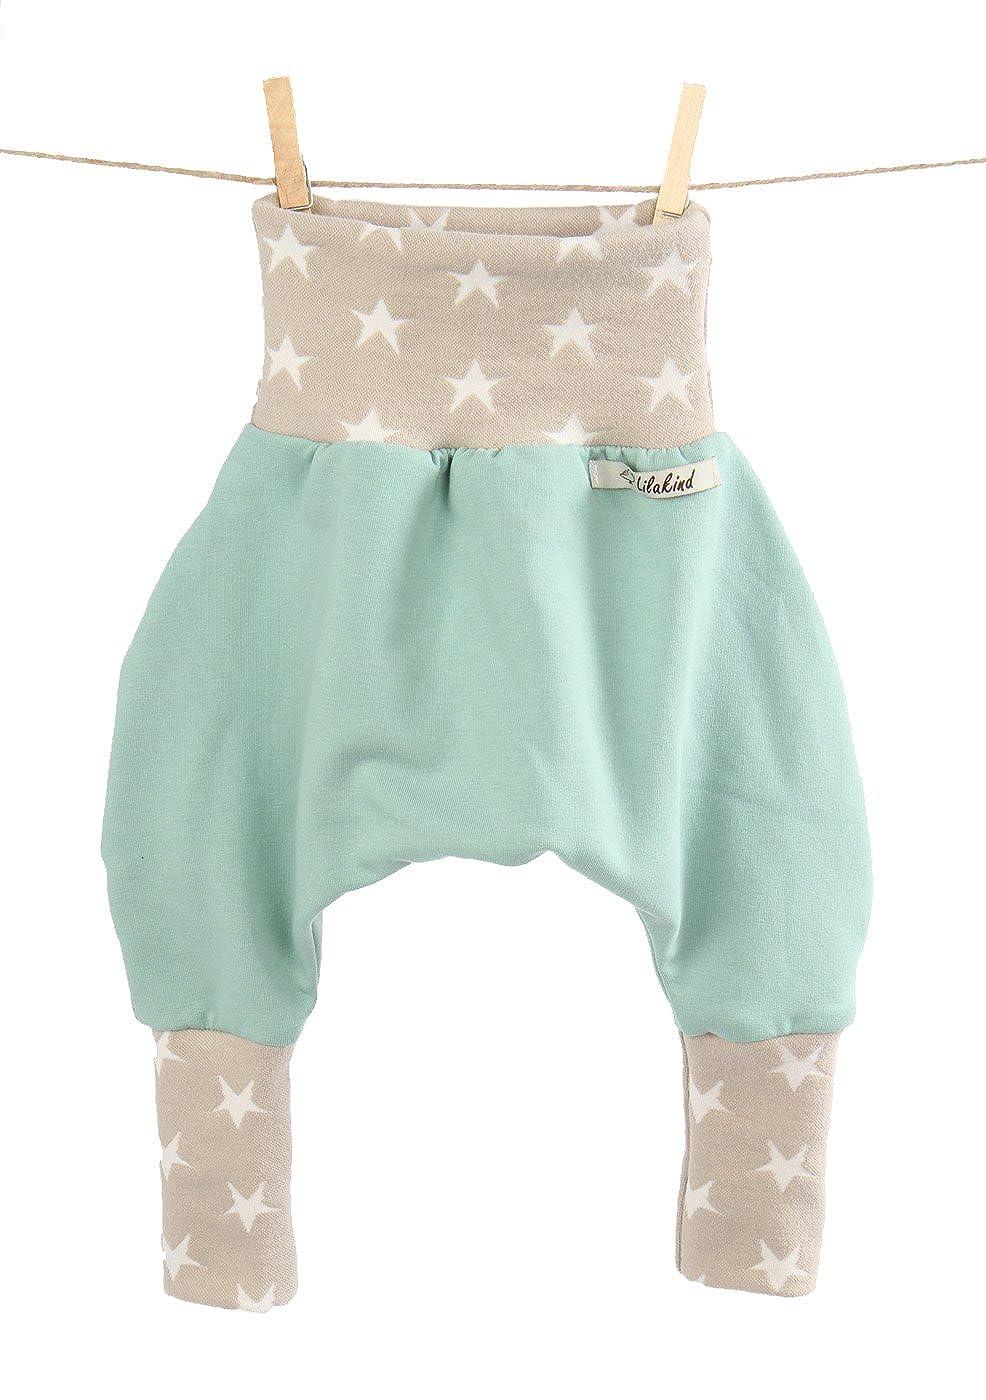 Pumphose Hose Babyhose Lilakind hochwertige Handarbeit Jersey Sweat Mint Sterne Sand MD-PH012_2mint_sternesand